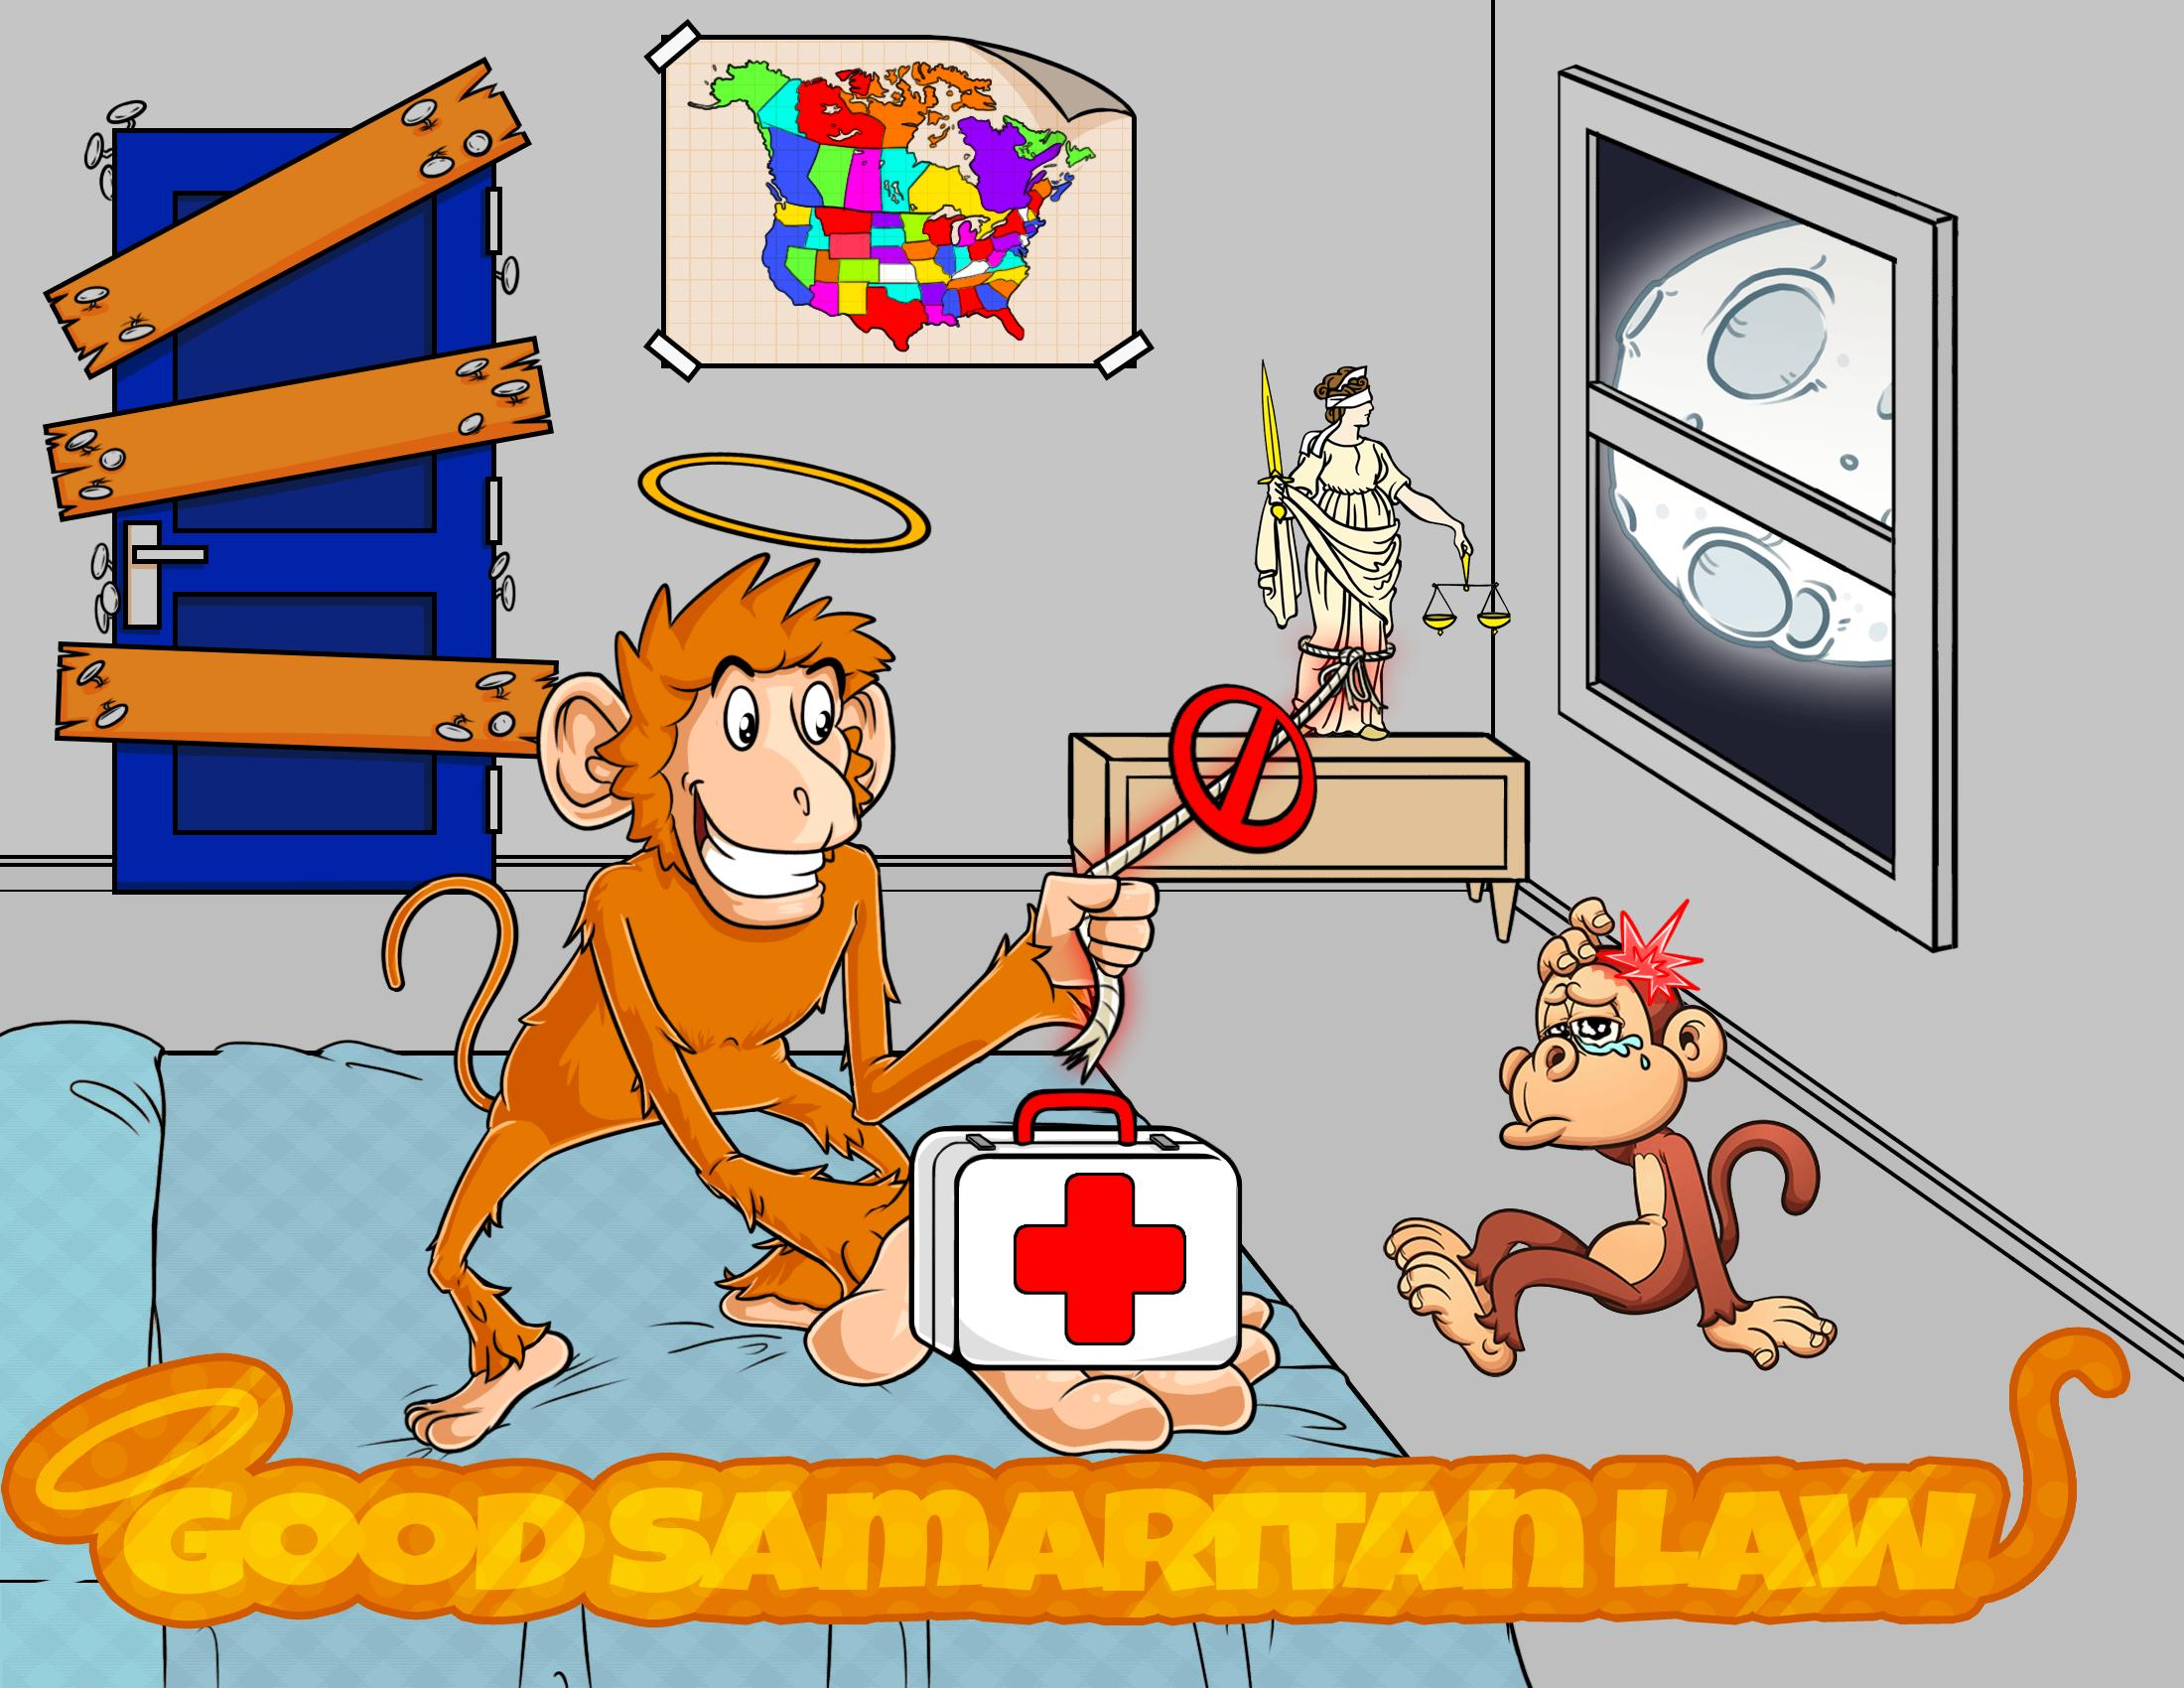 Good Samaritan Law